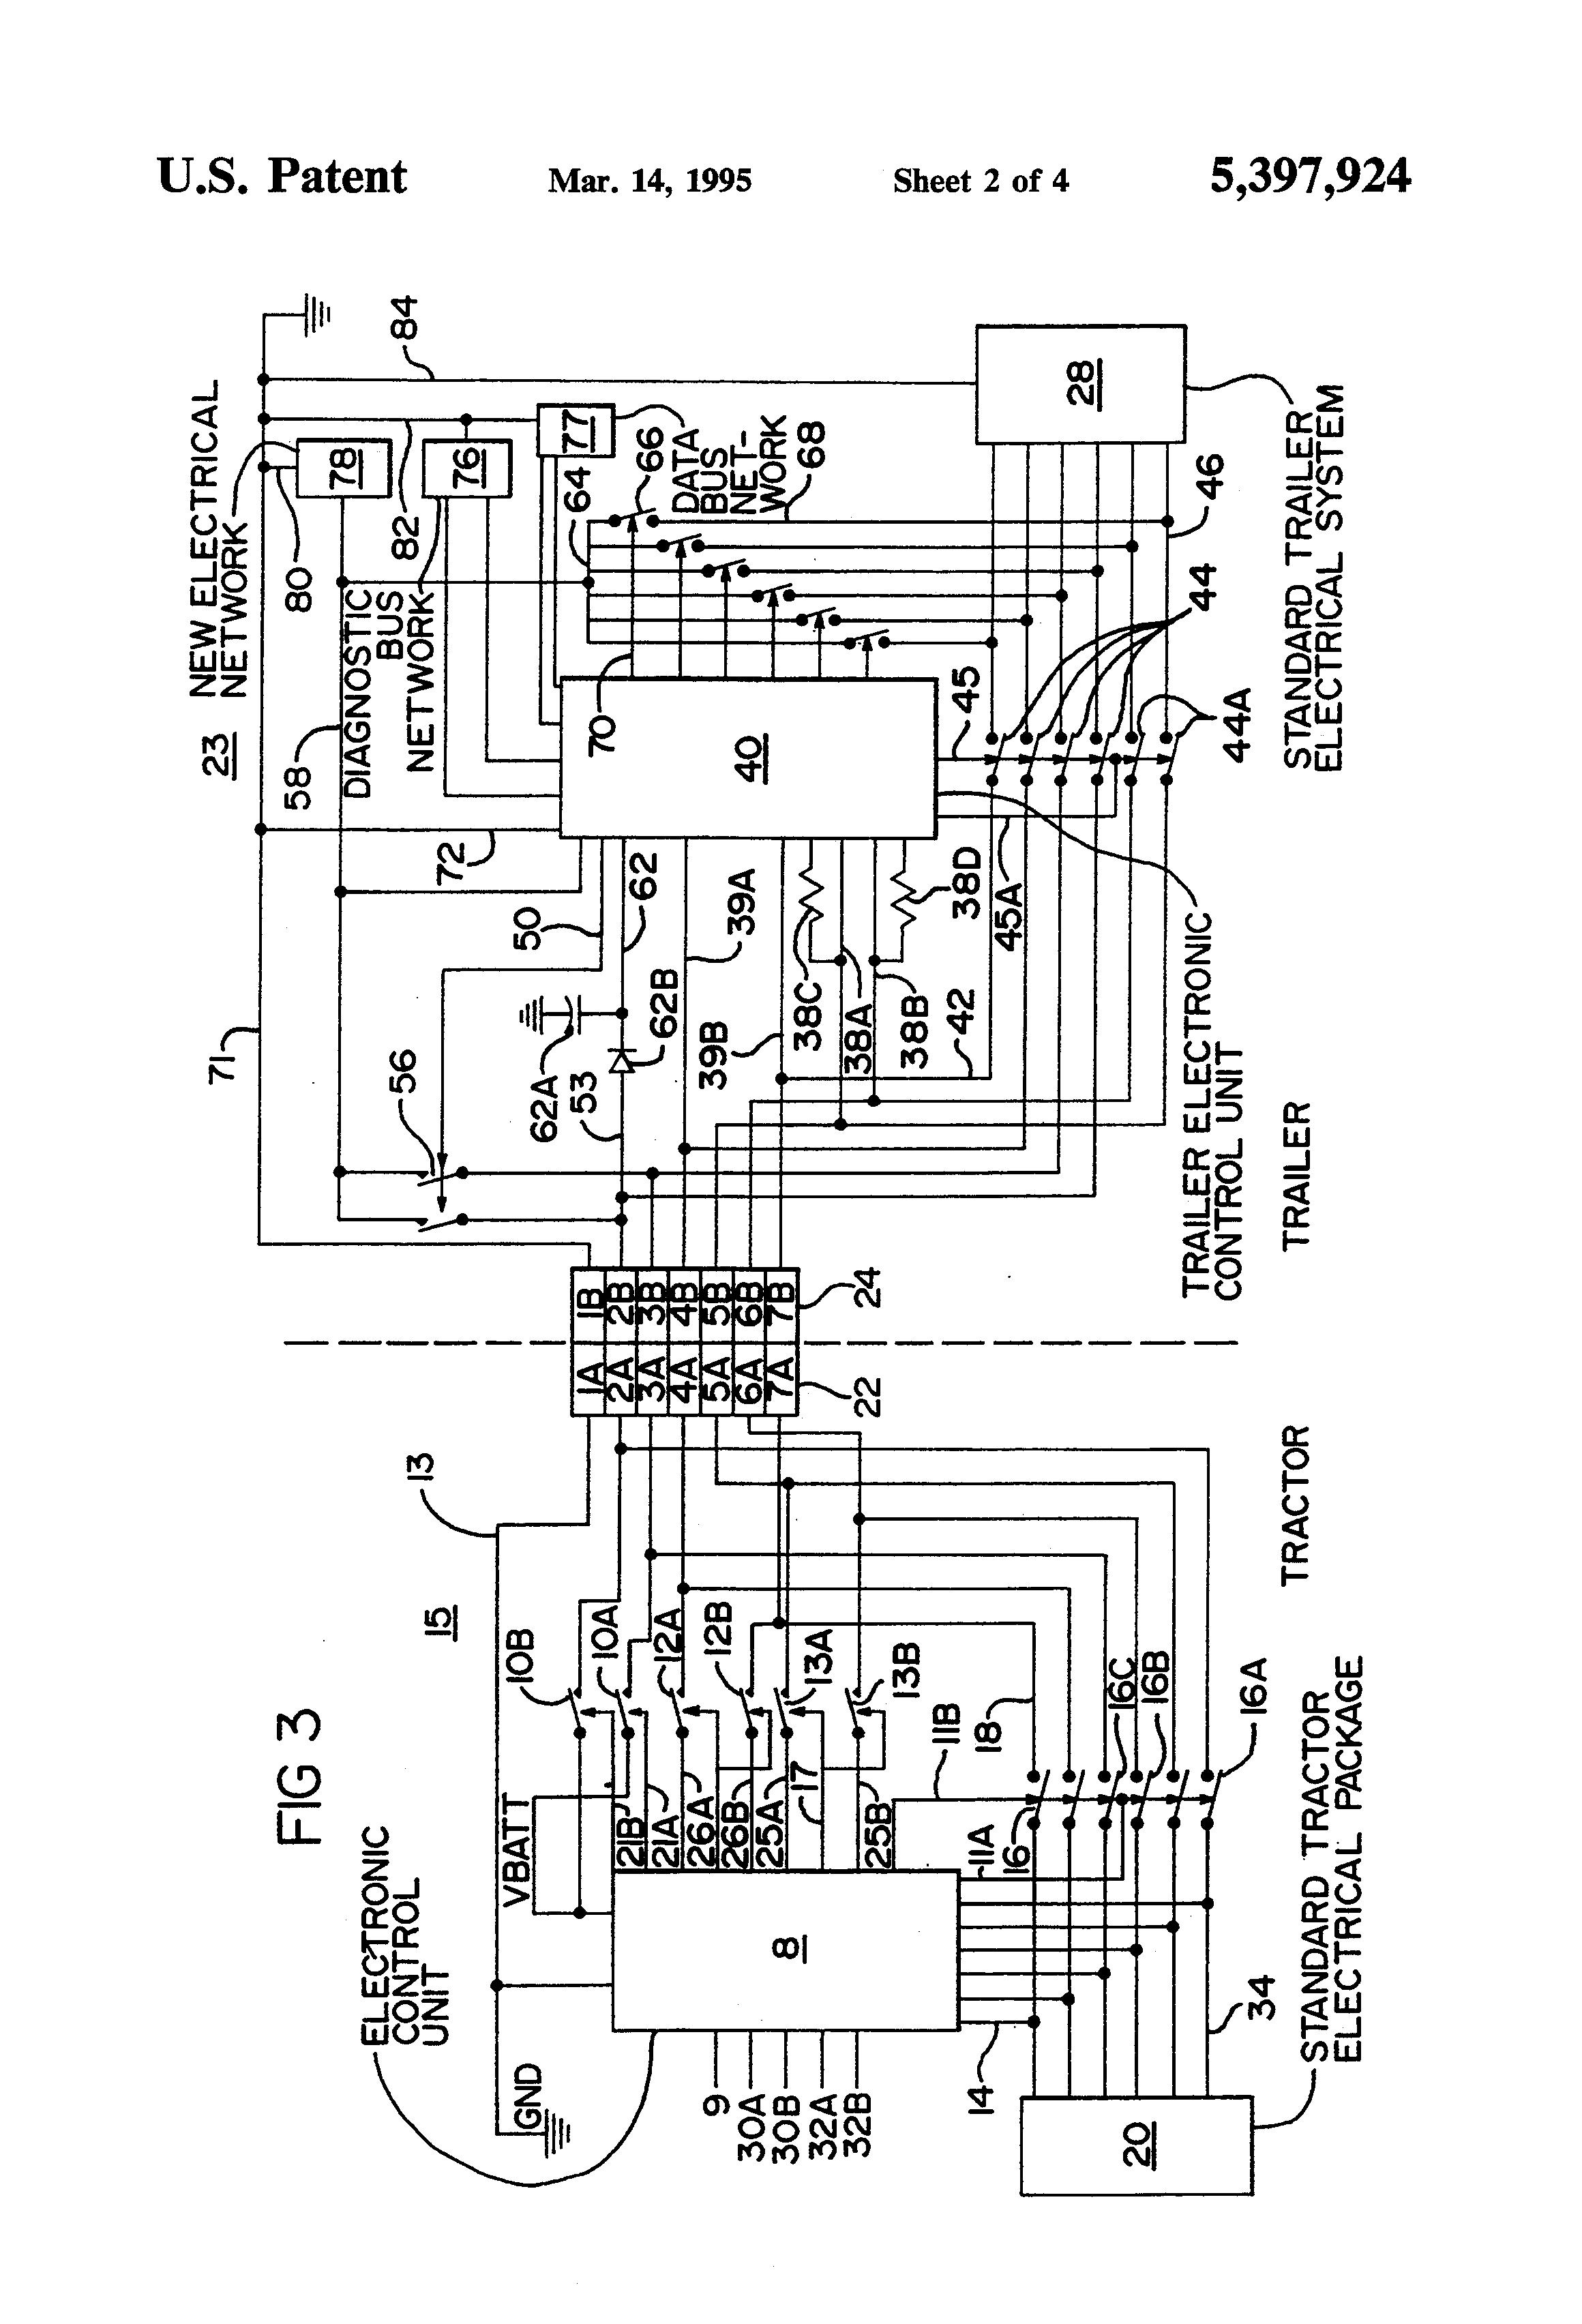 Meritor Wabco Wiring Diagram - Fuse Box Diagram For 1986 Camaro -  viiintage.fuses-boxs.genericocialis.itWiring Diagram Resource